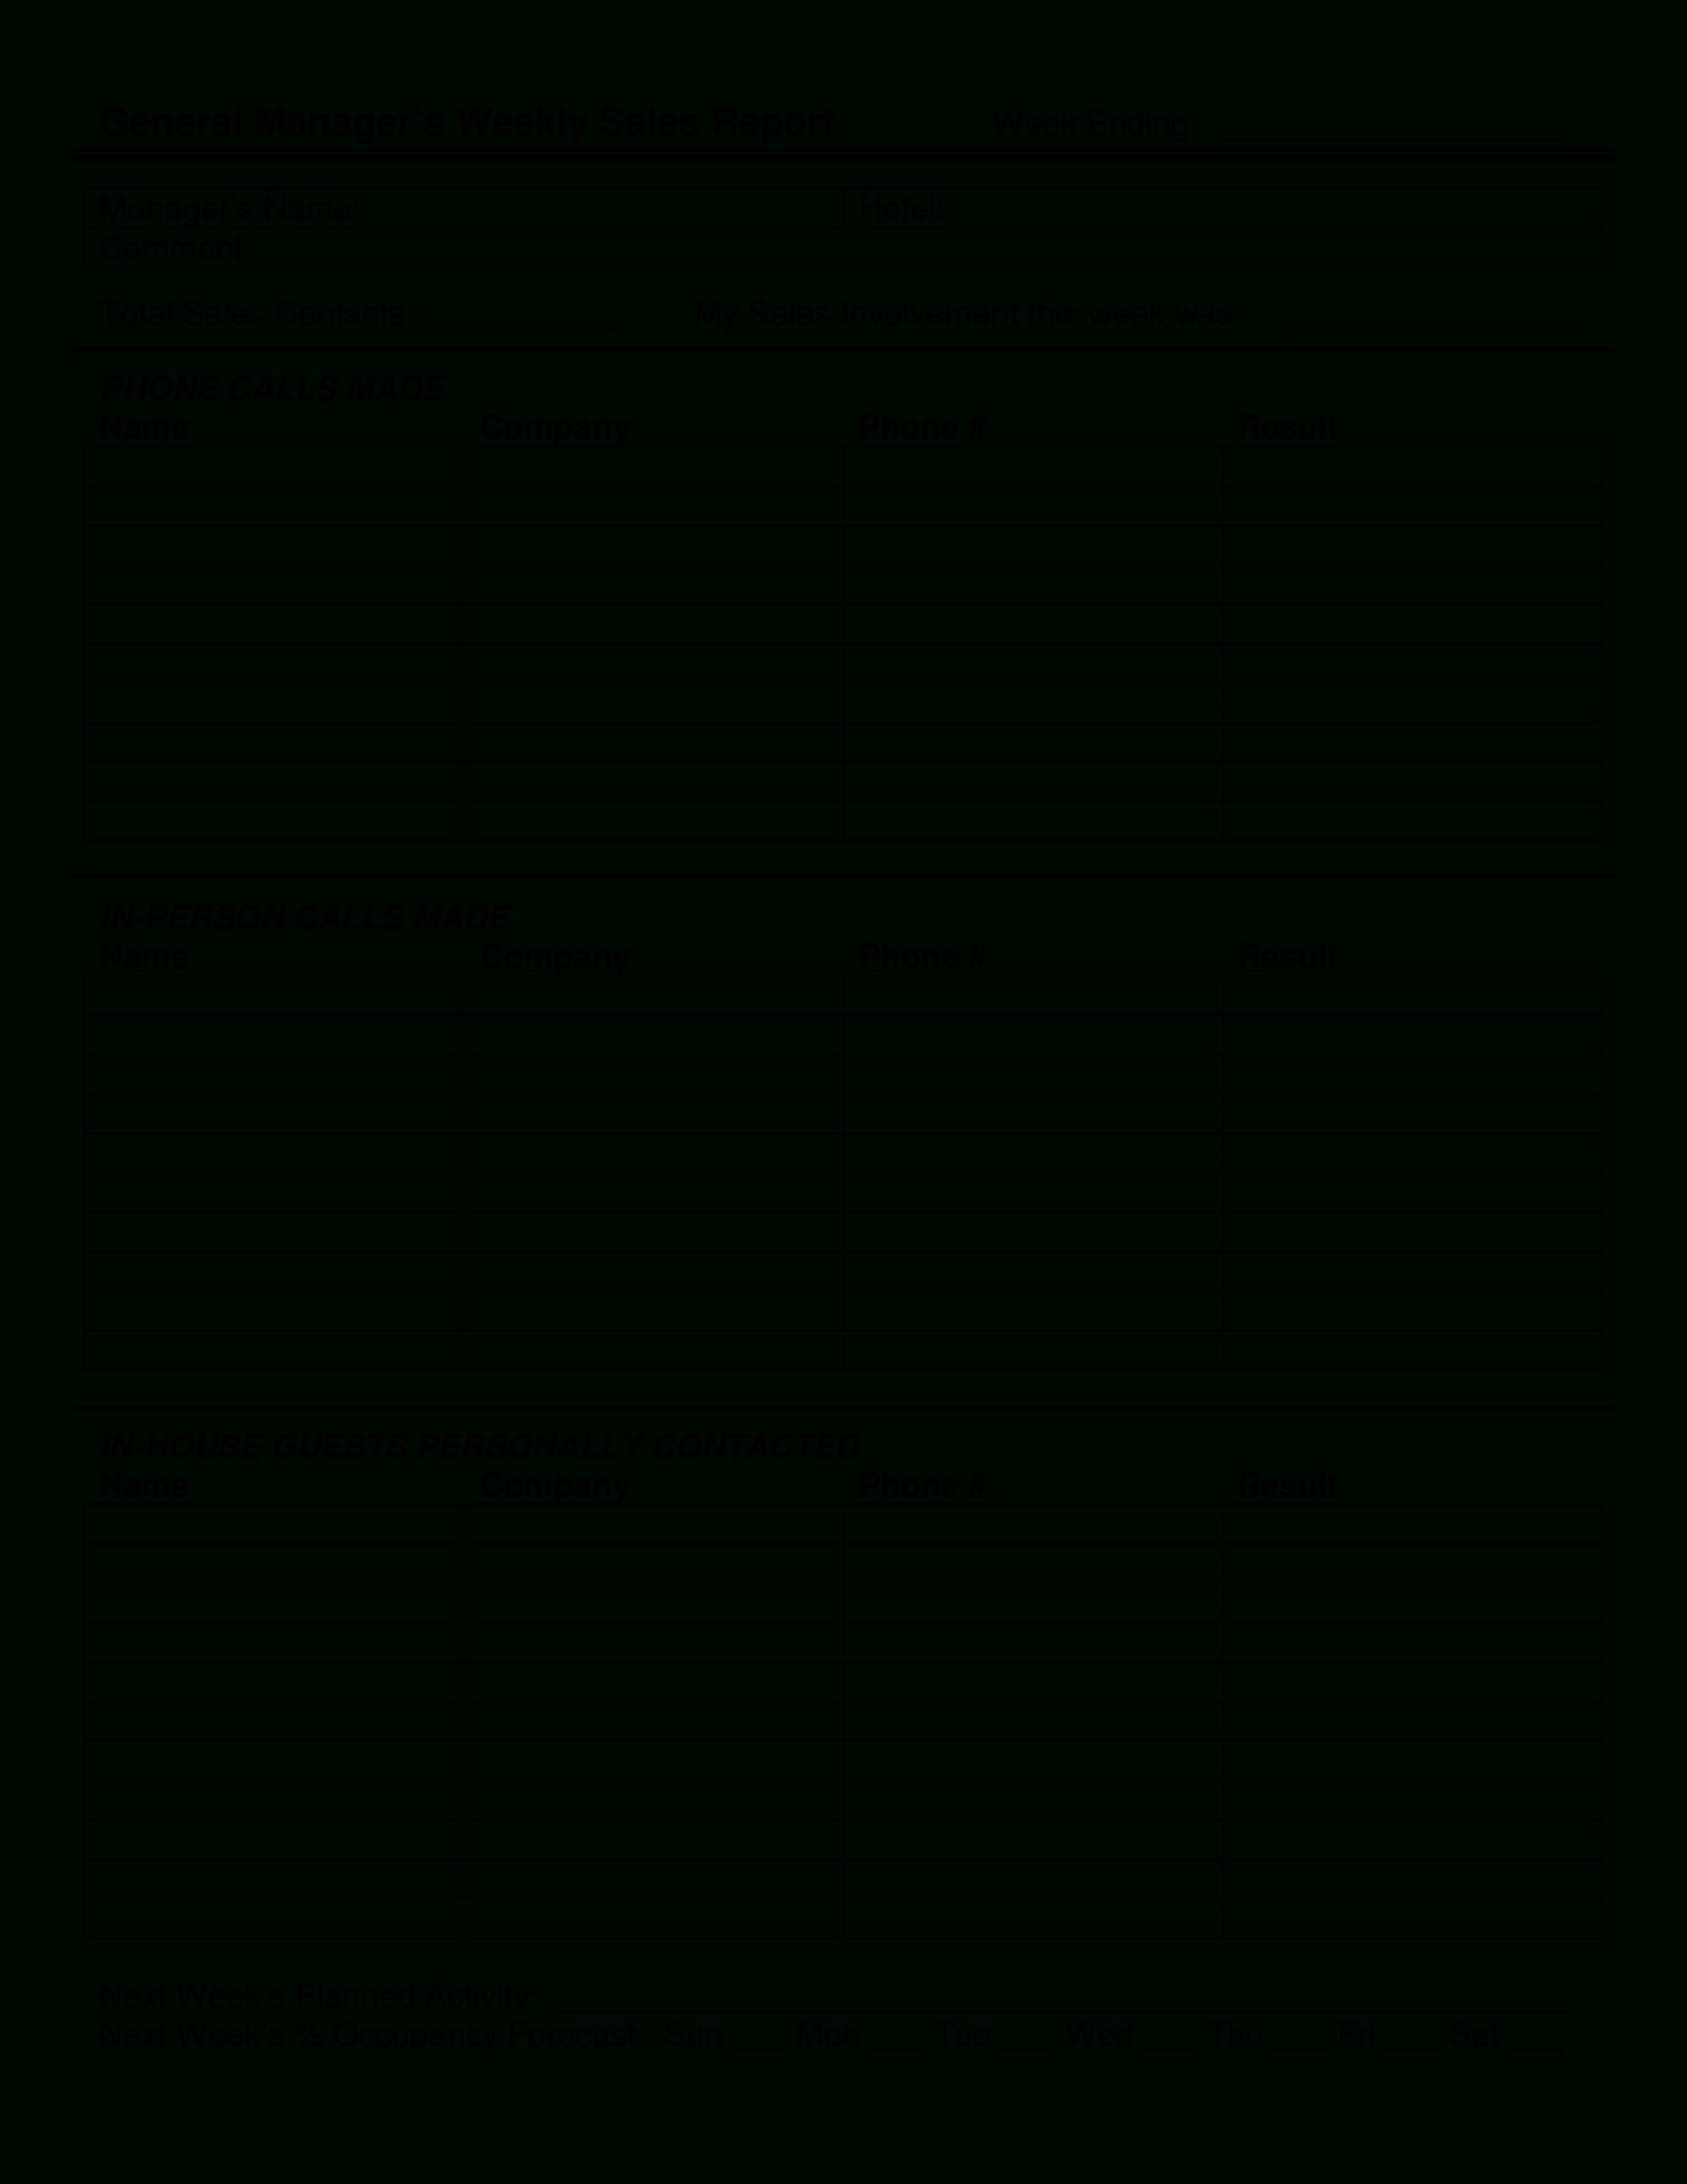 014 Weekly Activities Report Template Fantastic Ideas Free Pertaining To Weekly Activity Report Template